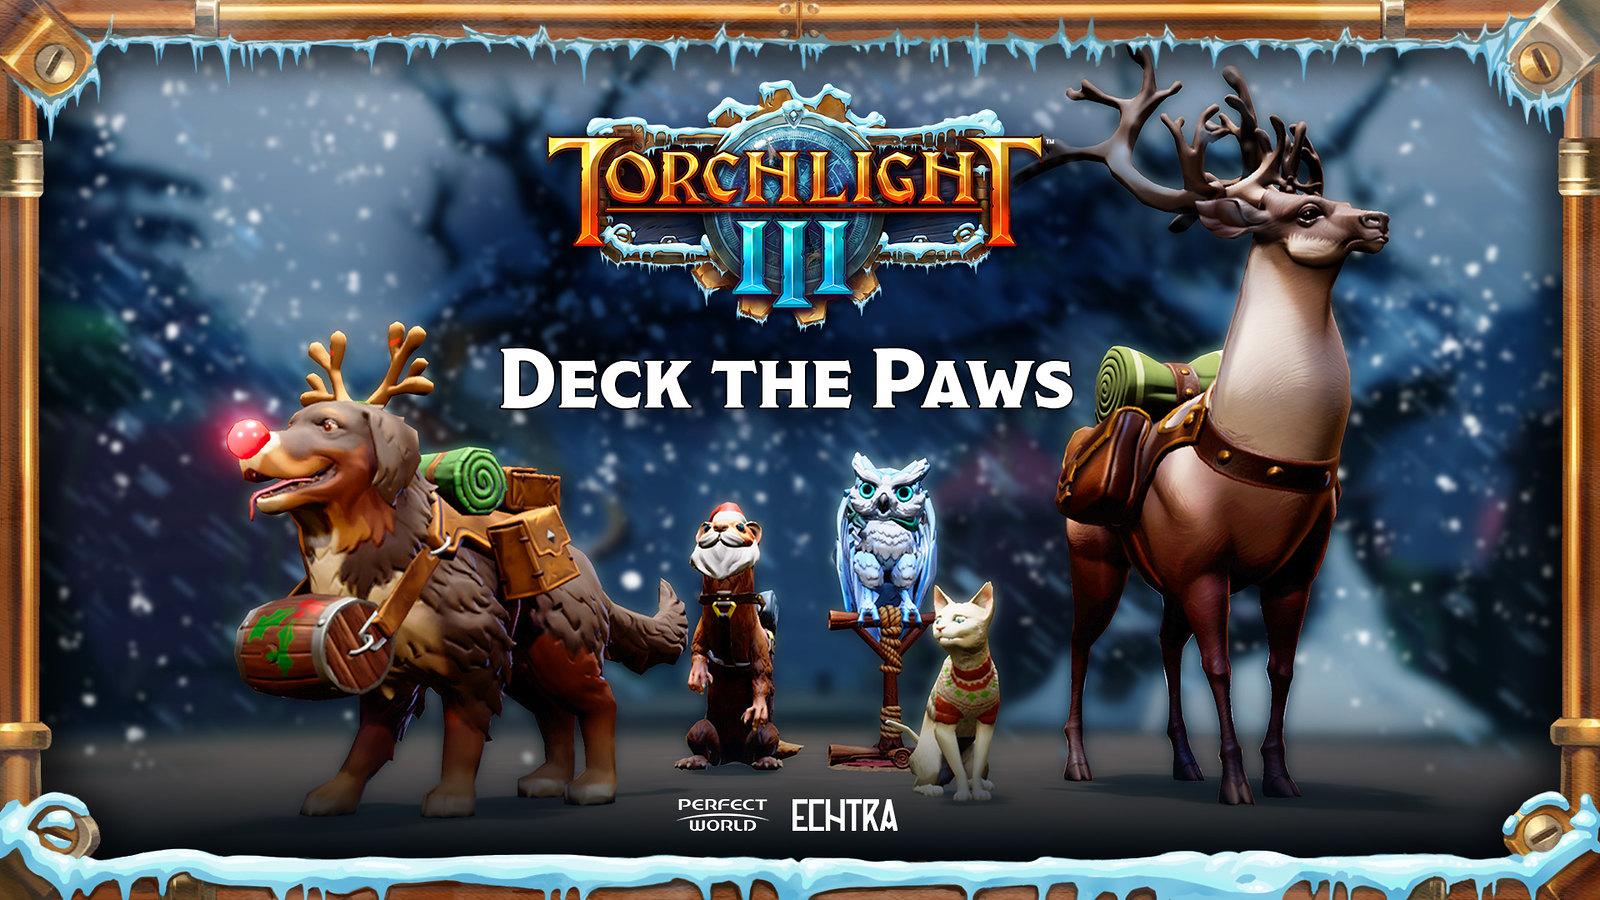 Perfect World (Torchlight III)